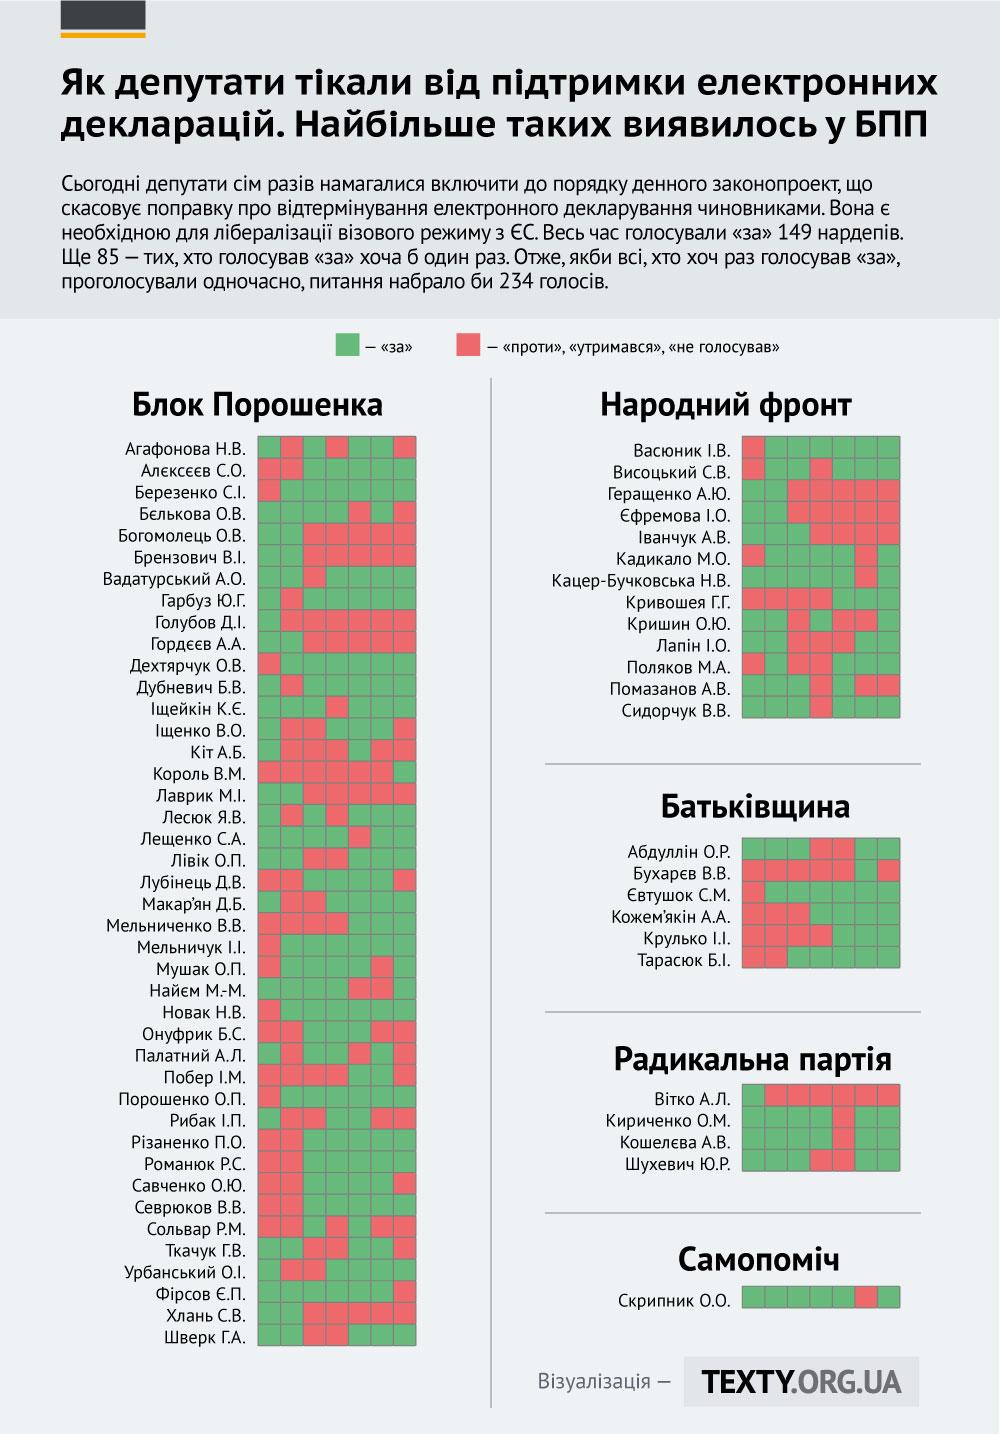 Шимкив проинформировал европарламентариев о прогрессе реформ в Украине - Цензор.НЕТ 4203